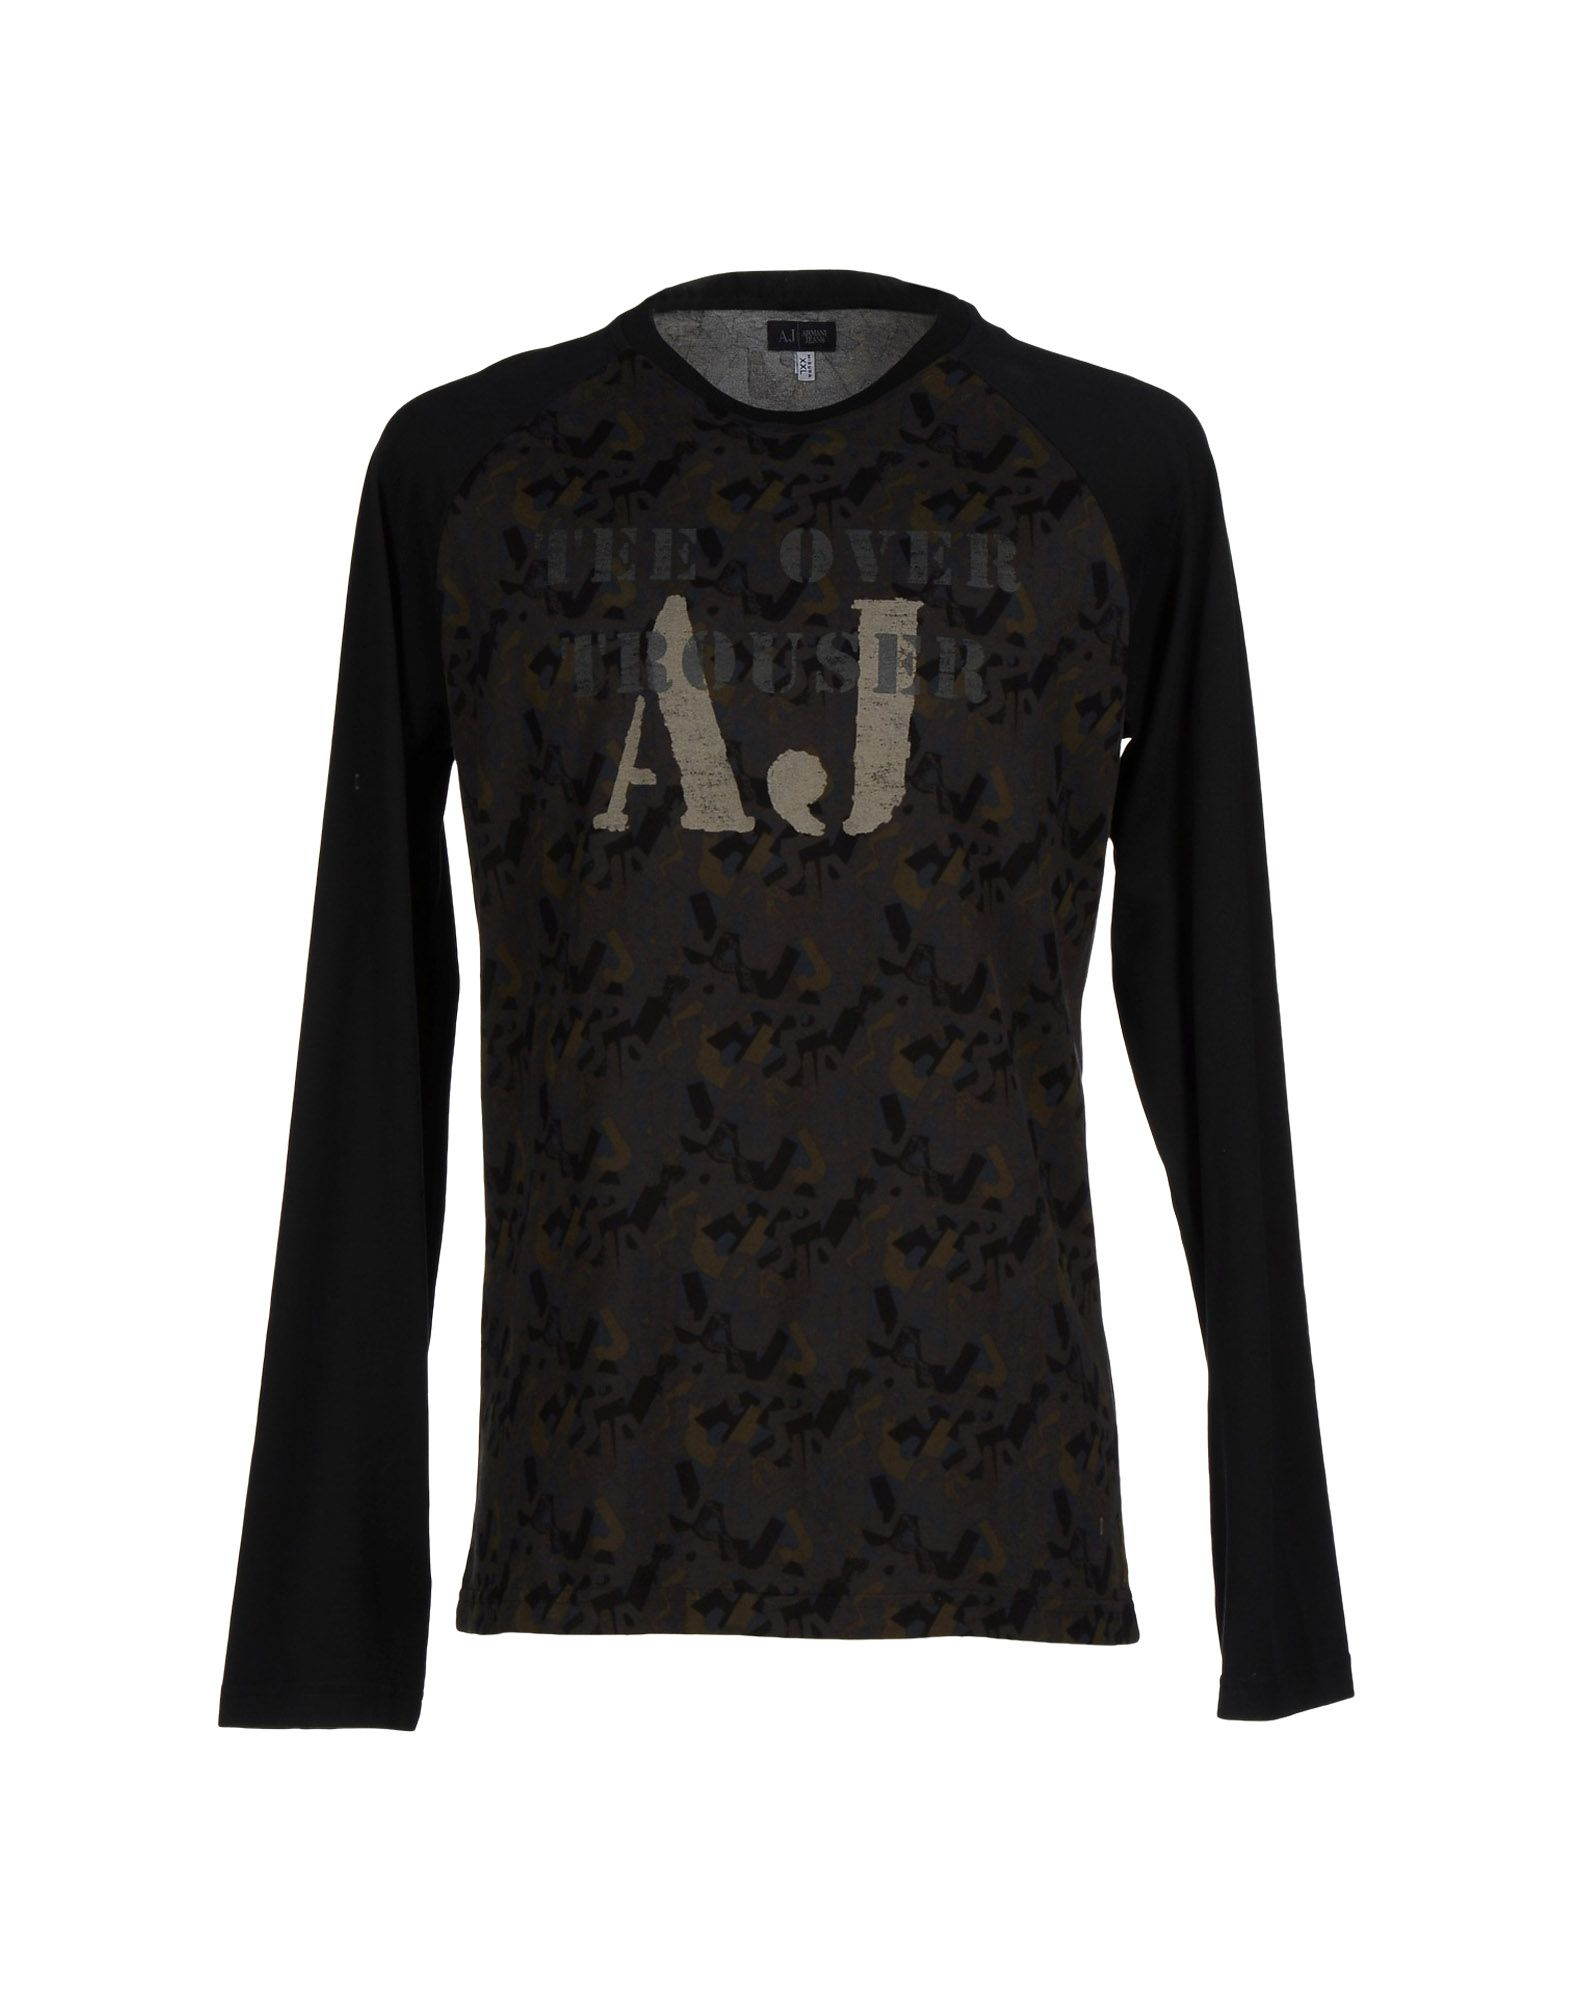 lyst armani jeans t shirt in brown for men. Black Bedroom Furniture Sets. Home Design Ideas